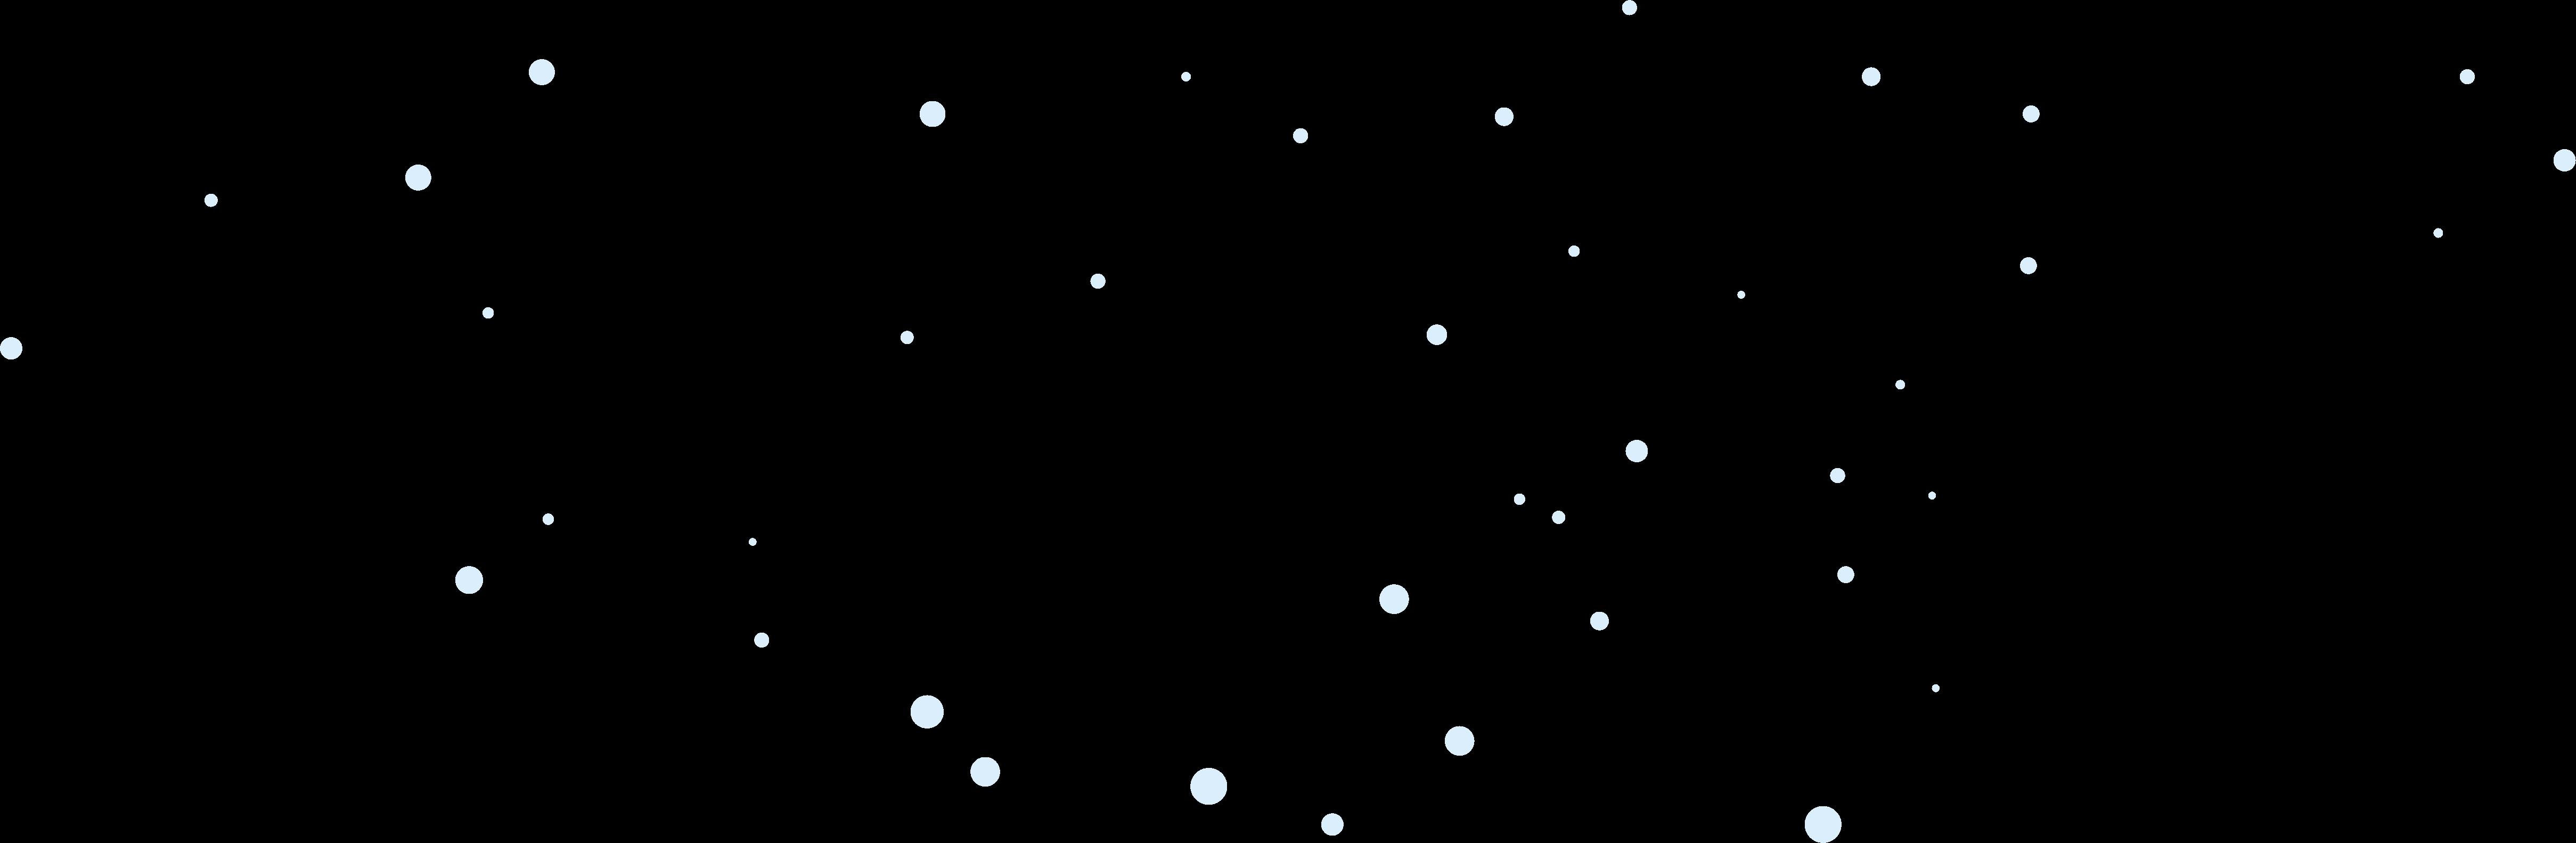 contact-dots-n